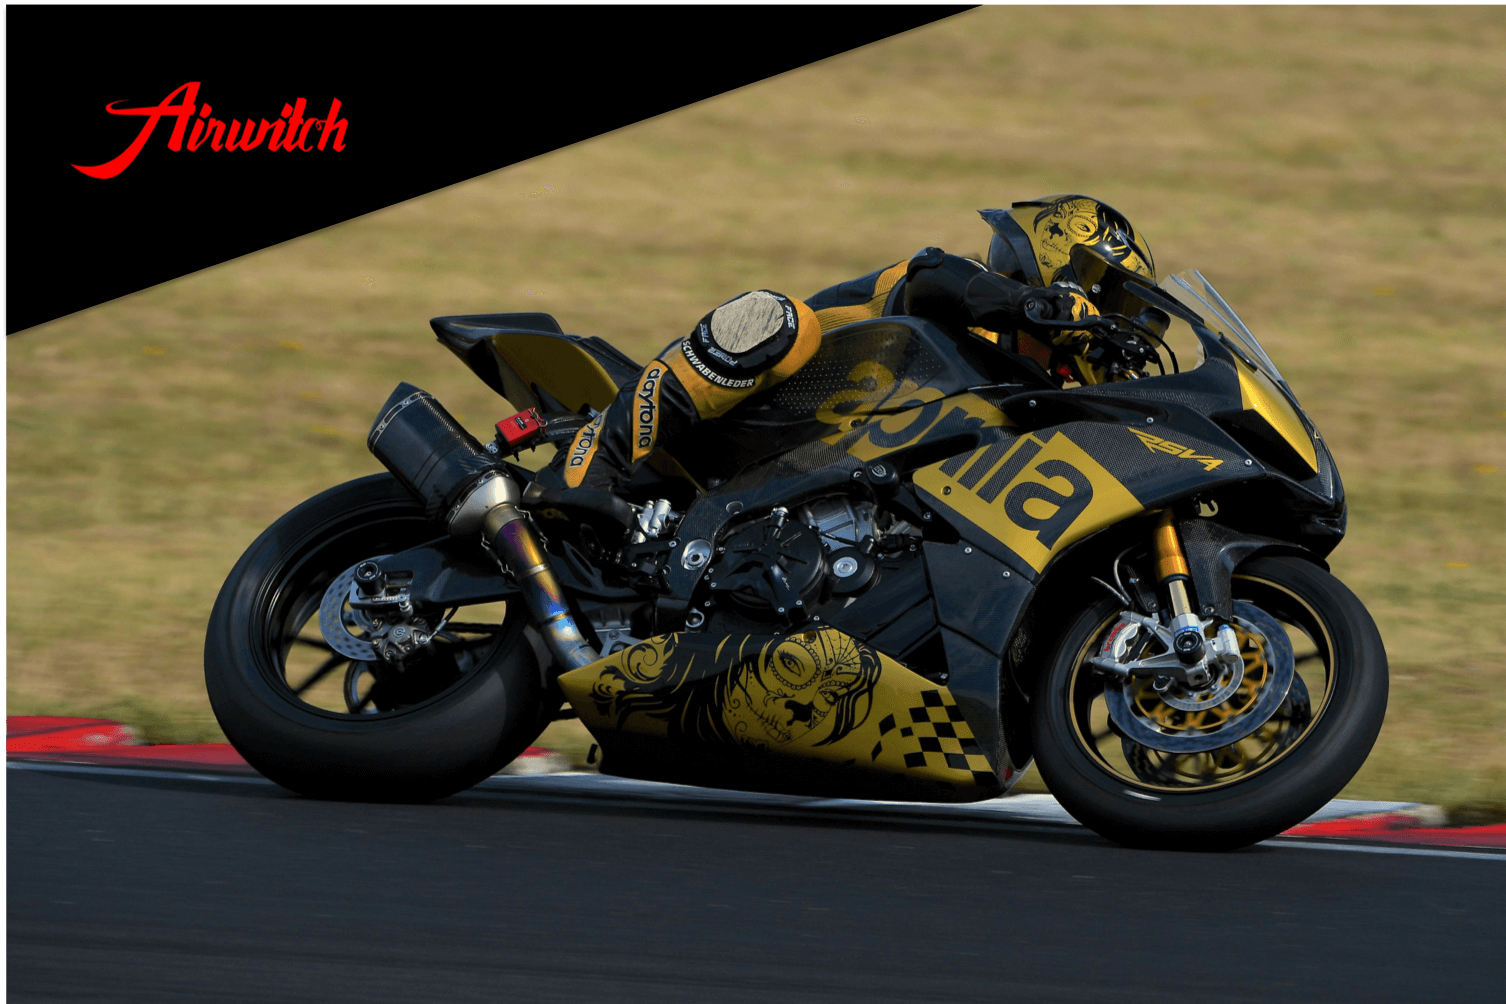 Aprilla RSV4 Carbon Helm AGV Pista GP Woman Custom Paint in schwarz gold mit la catrina und Airbrush Ornamenten